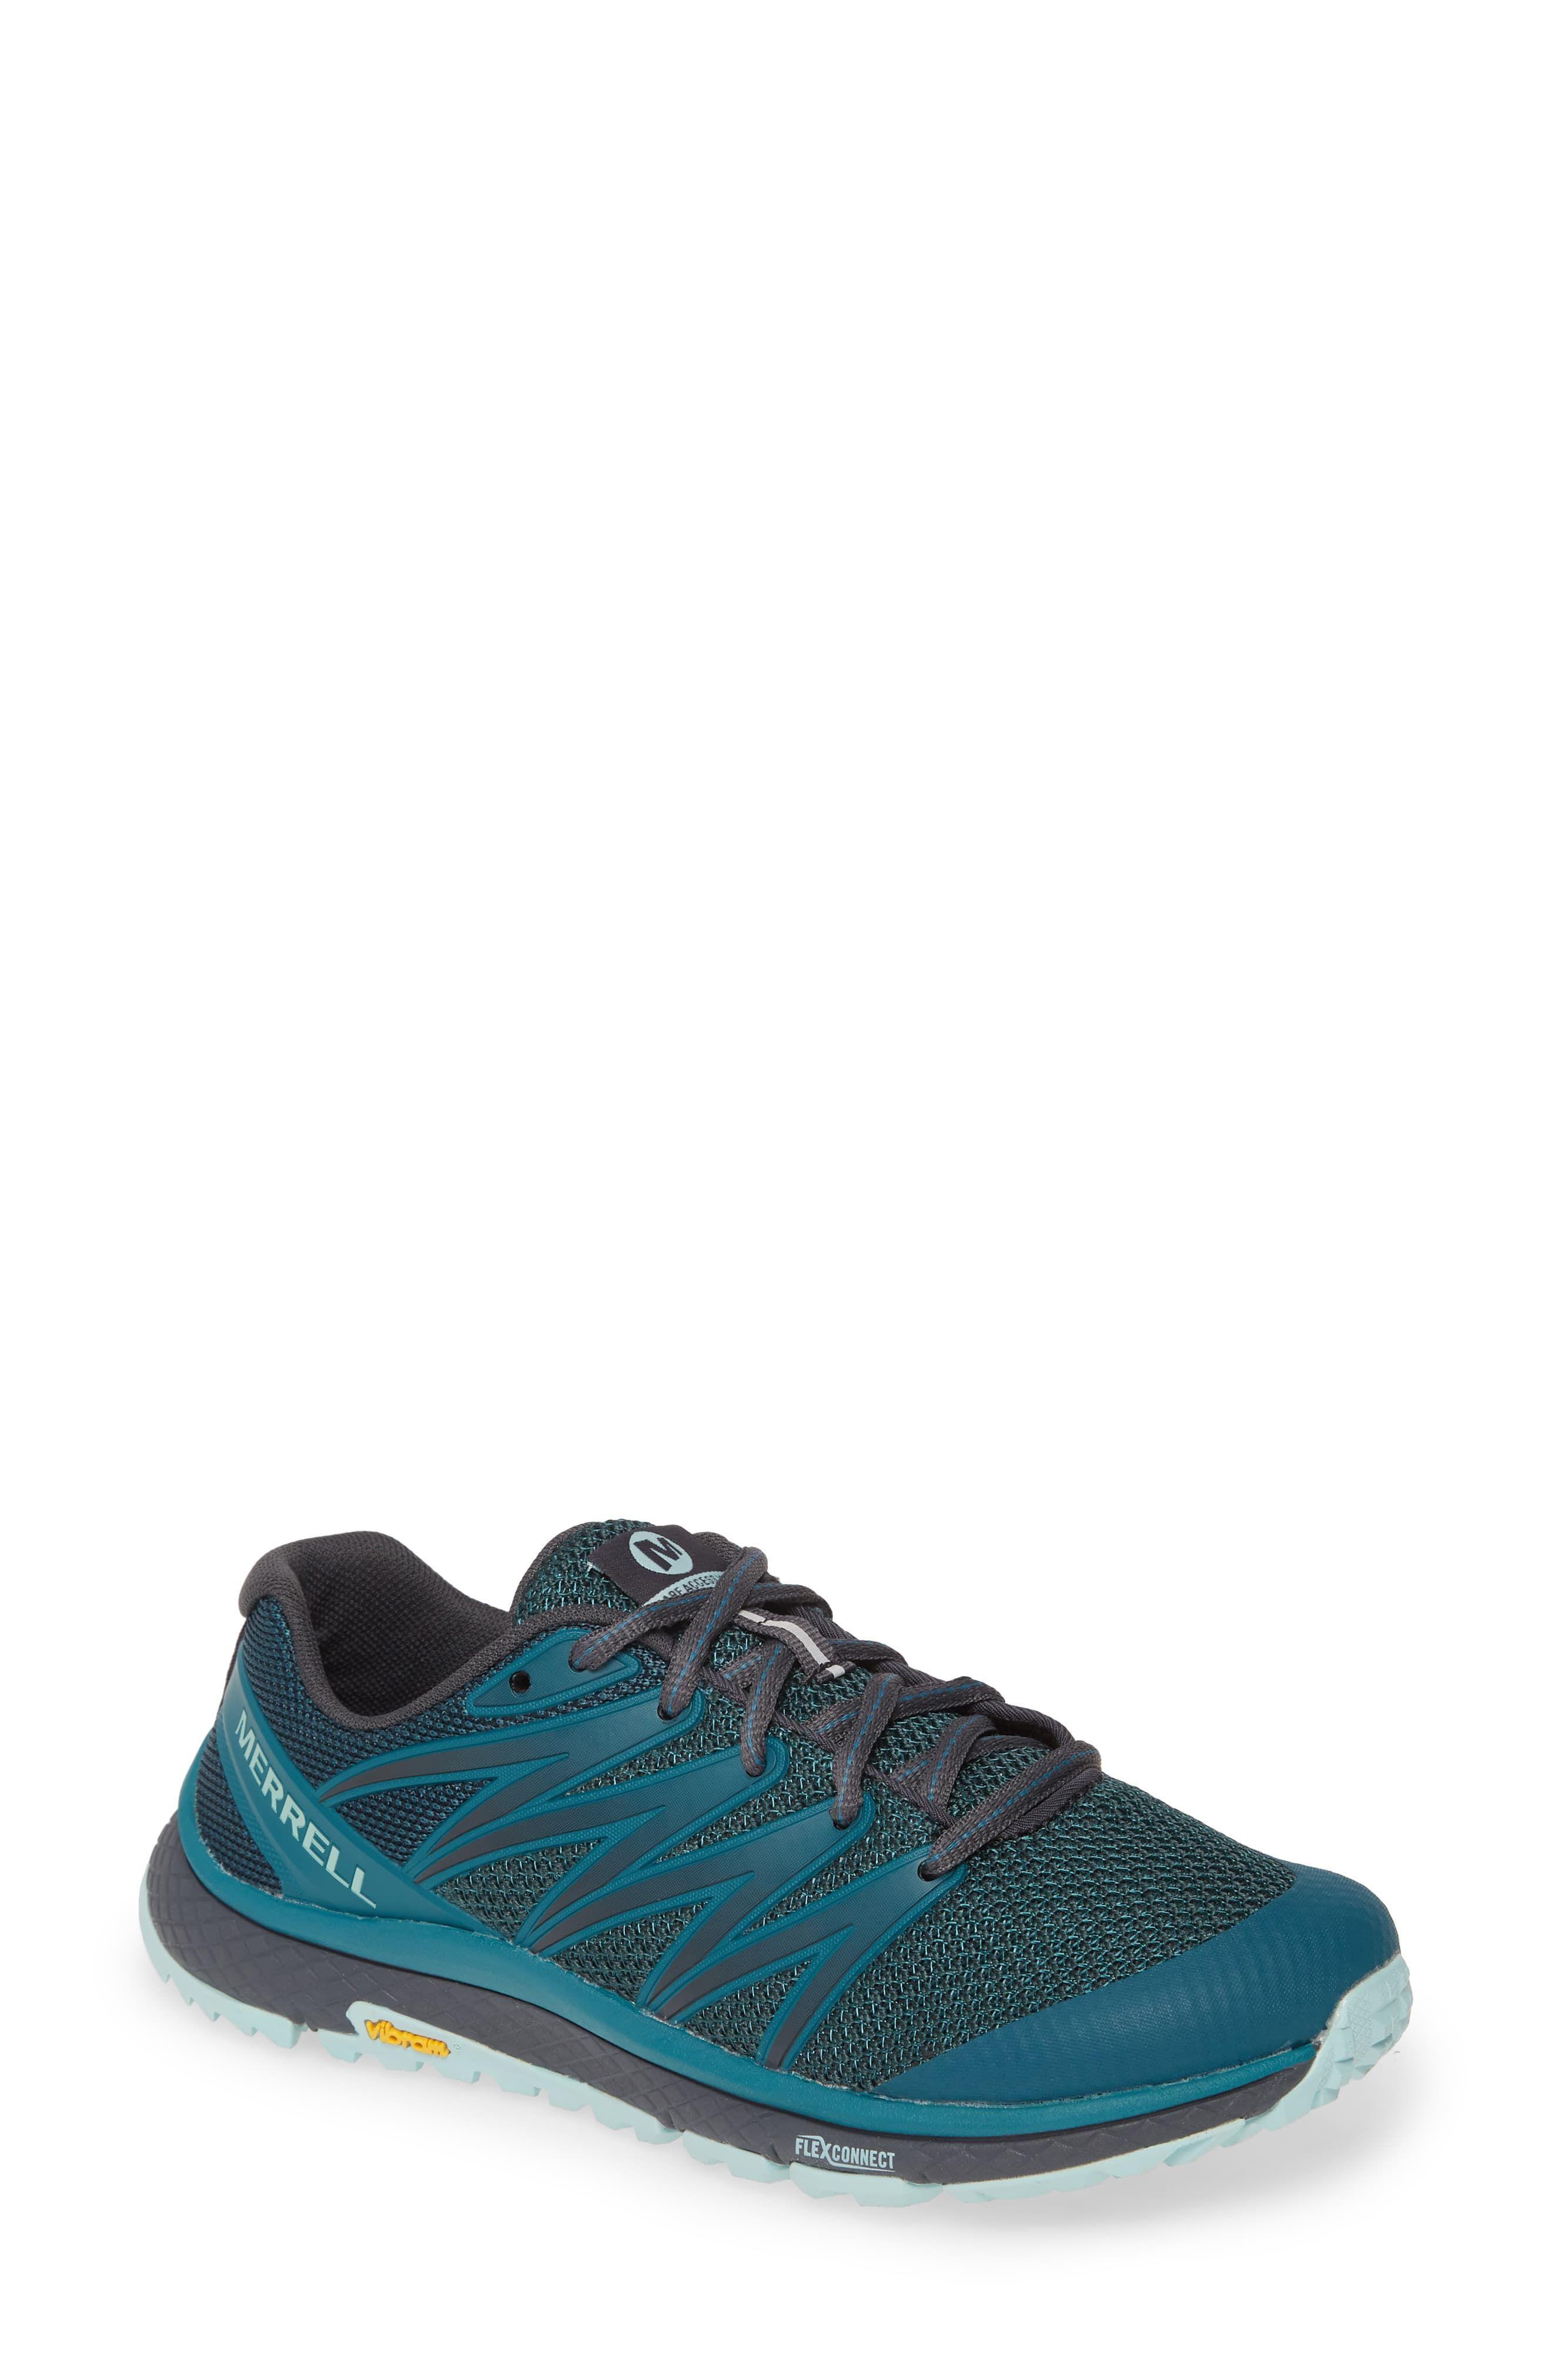 merrell walking shoes size 6 90